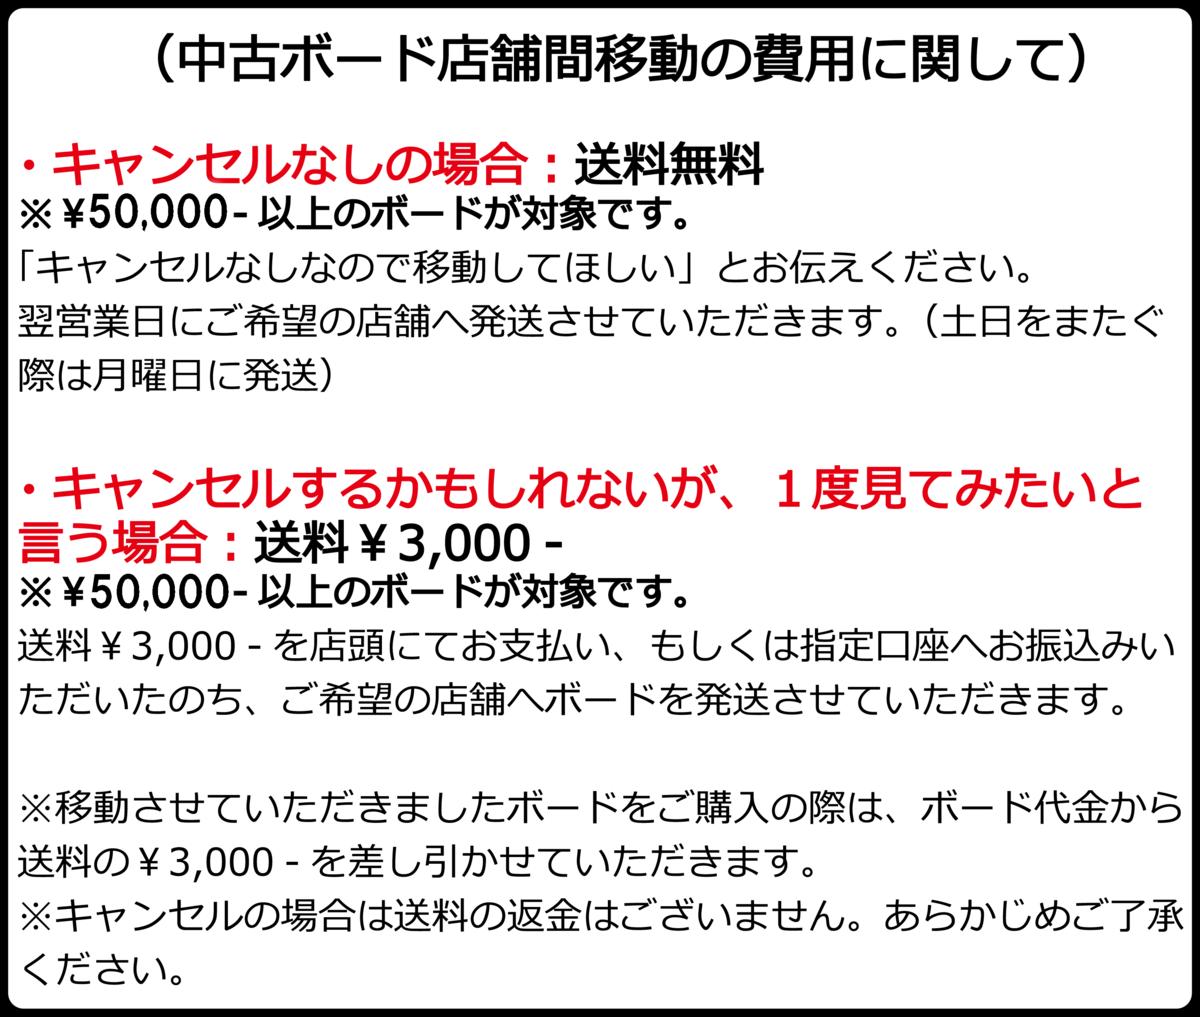 f:id:SEAKONG:20200202160040p:plain